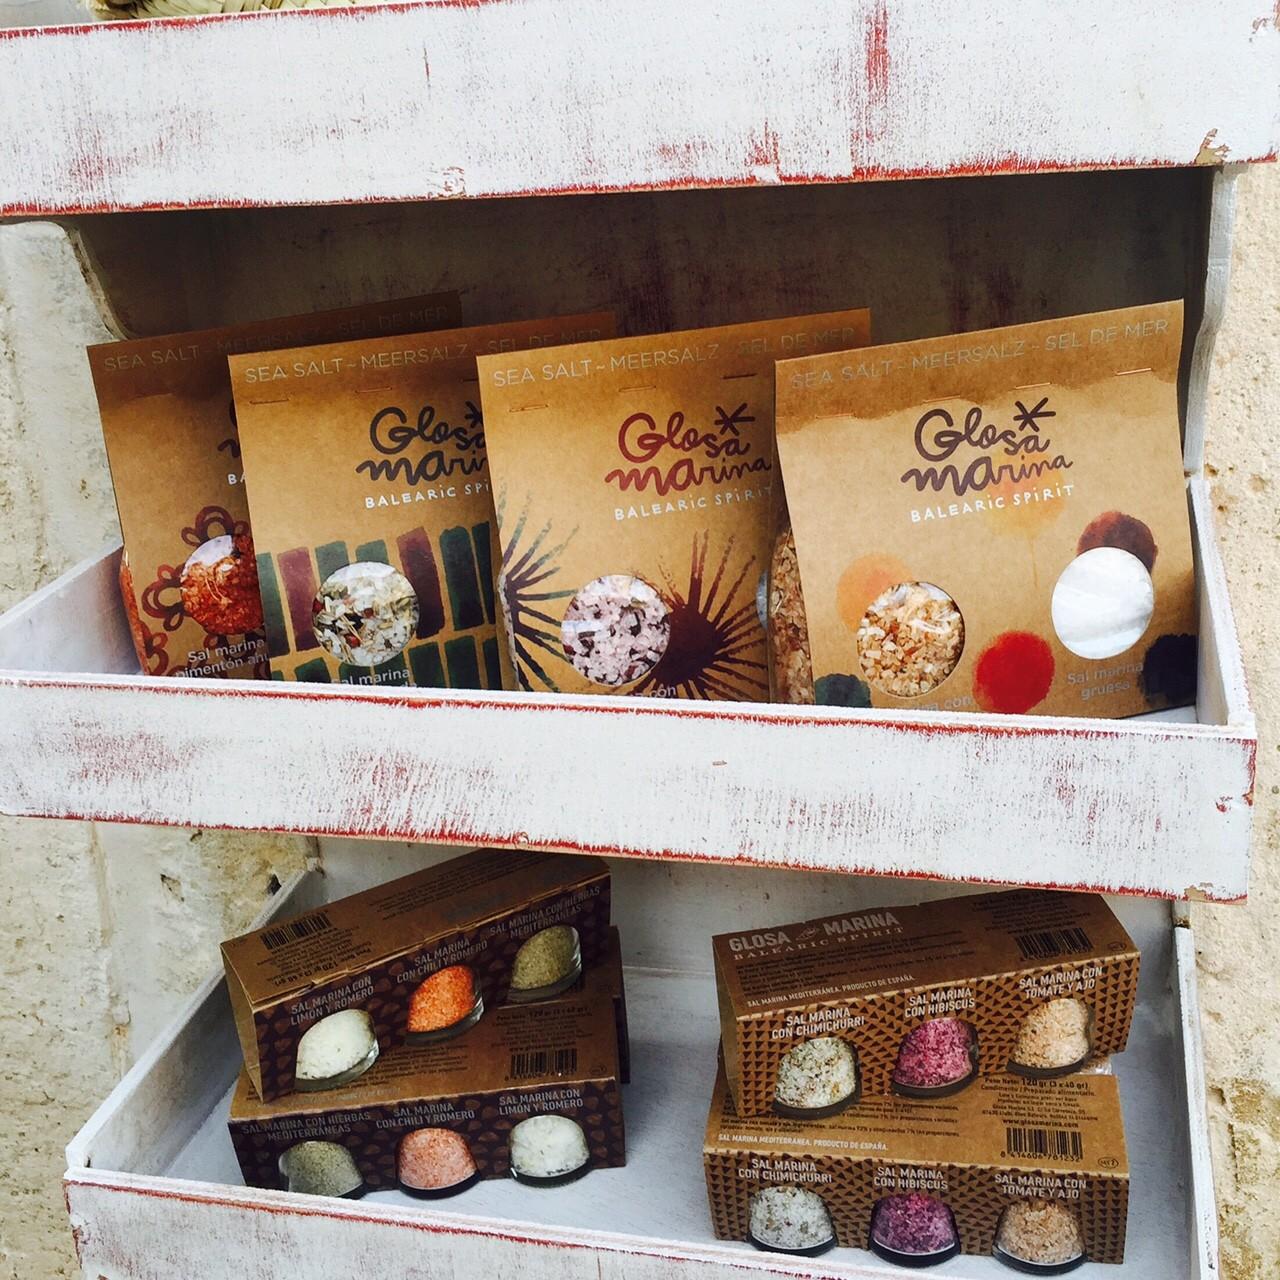 Mallorcaanse zout proeverij de leukste souvenir tips op Mallorcaanse Foodblog Foodinista